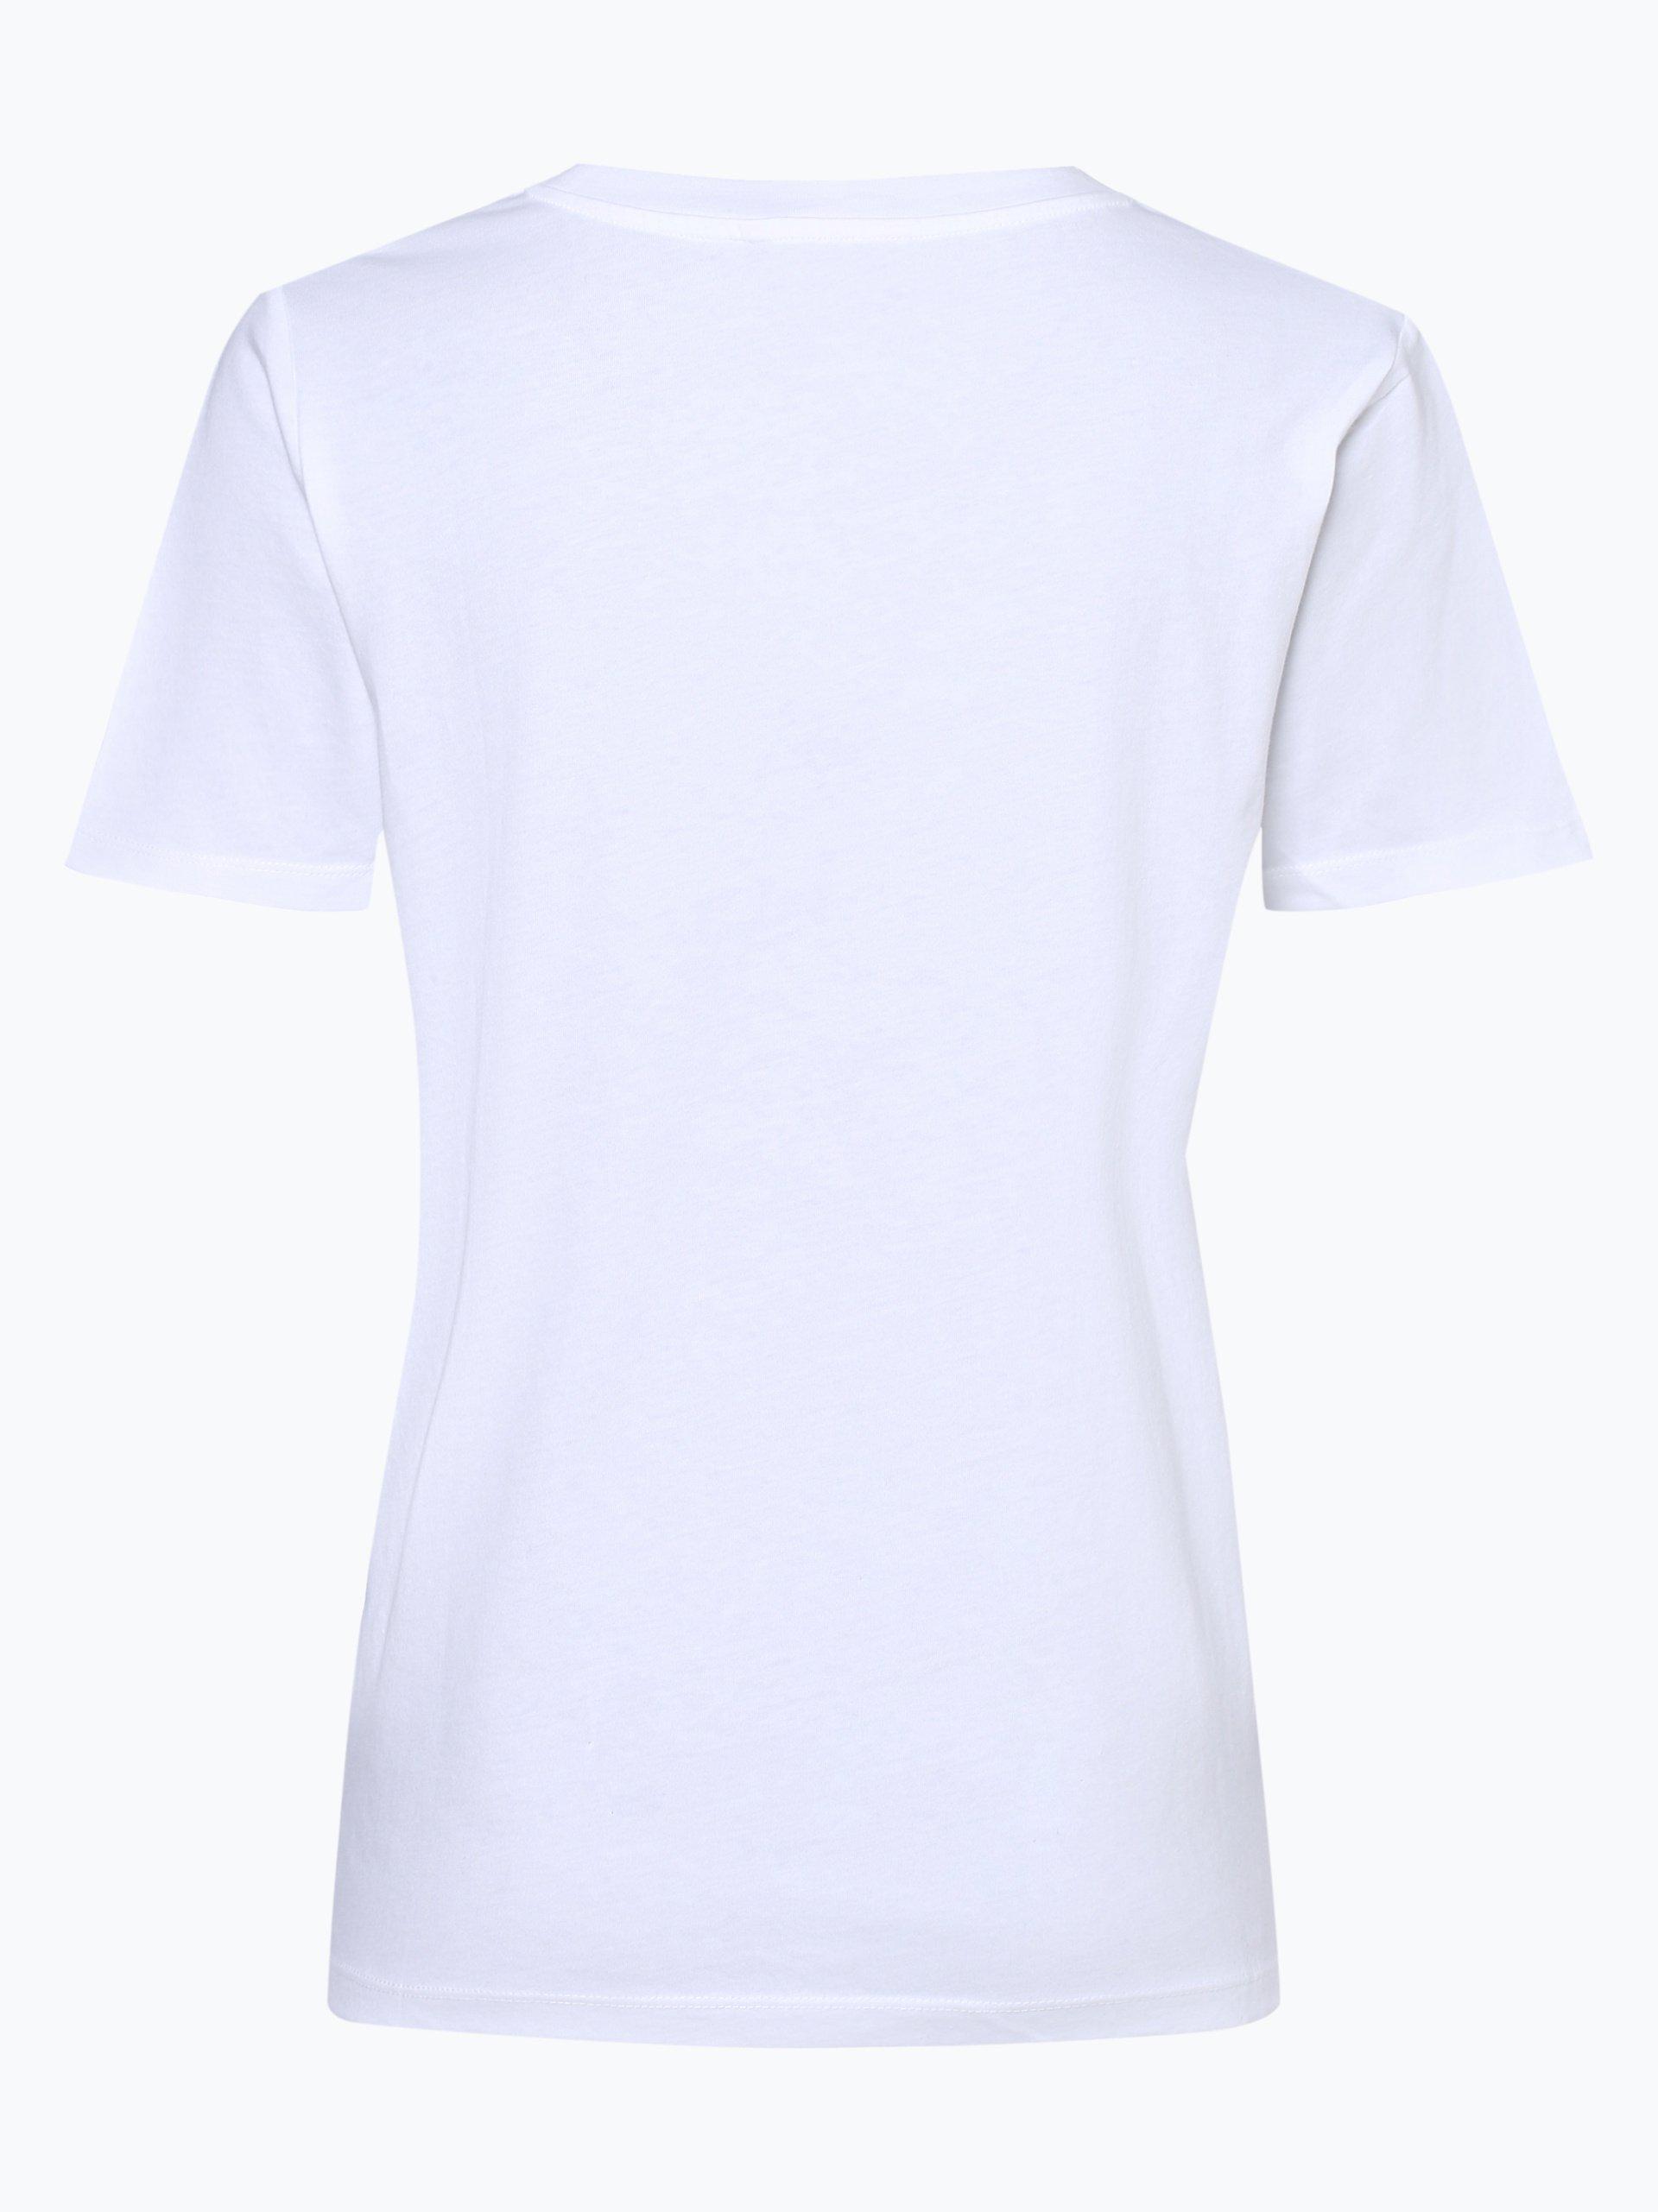 tommy hilfiger damen t shirt wei rot bedruckt online kaufen vangraaf com. Black Bedroom Furniture Sets. Home Design Ideas